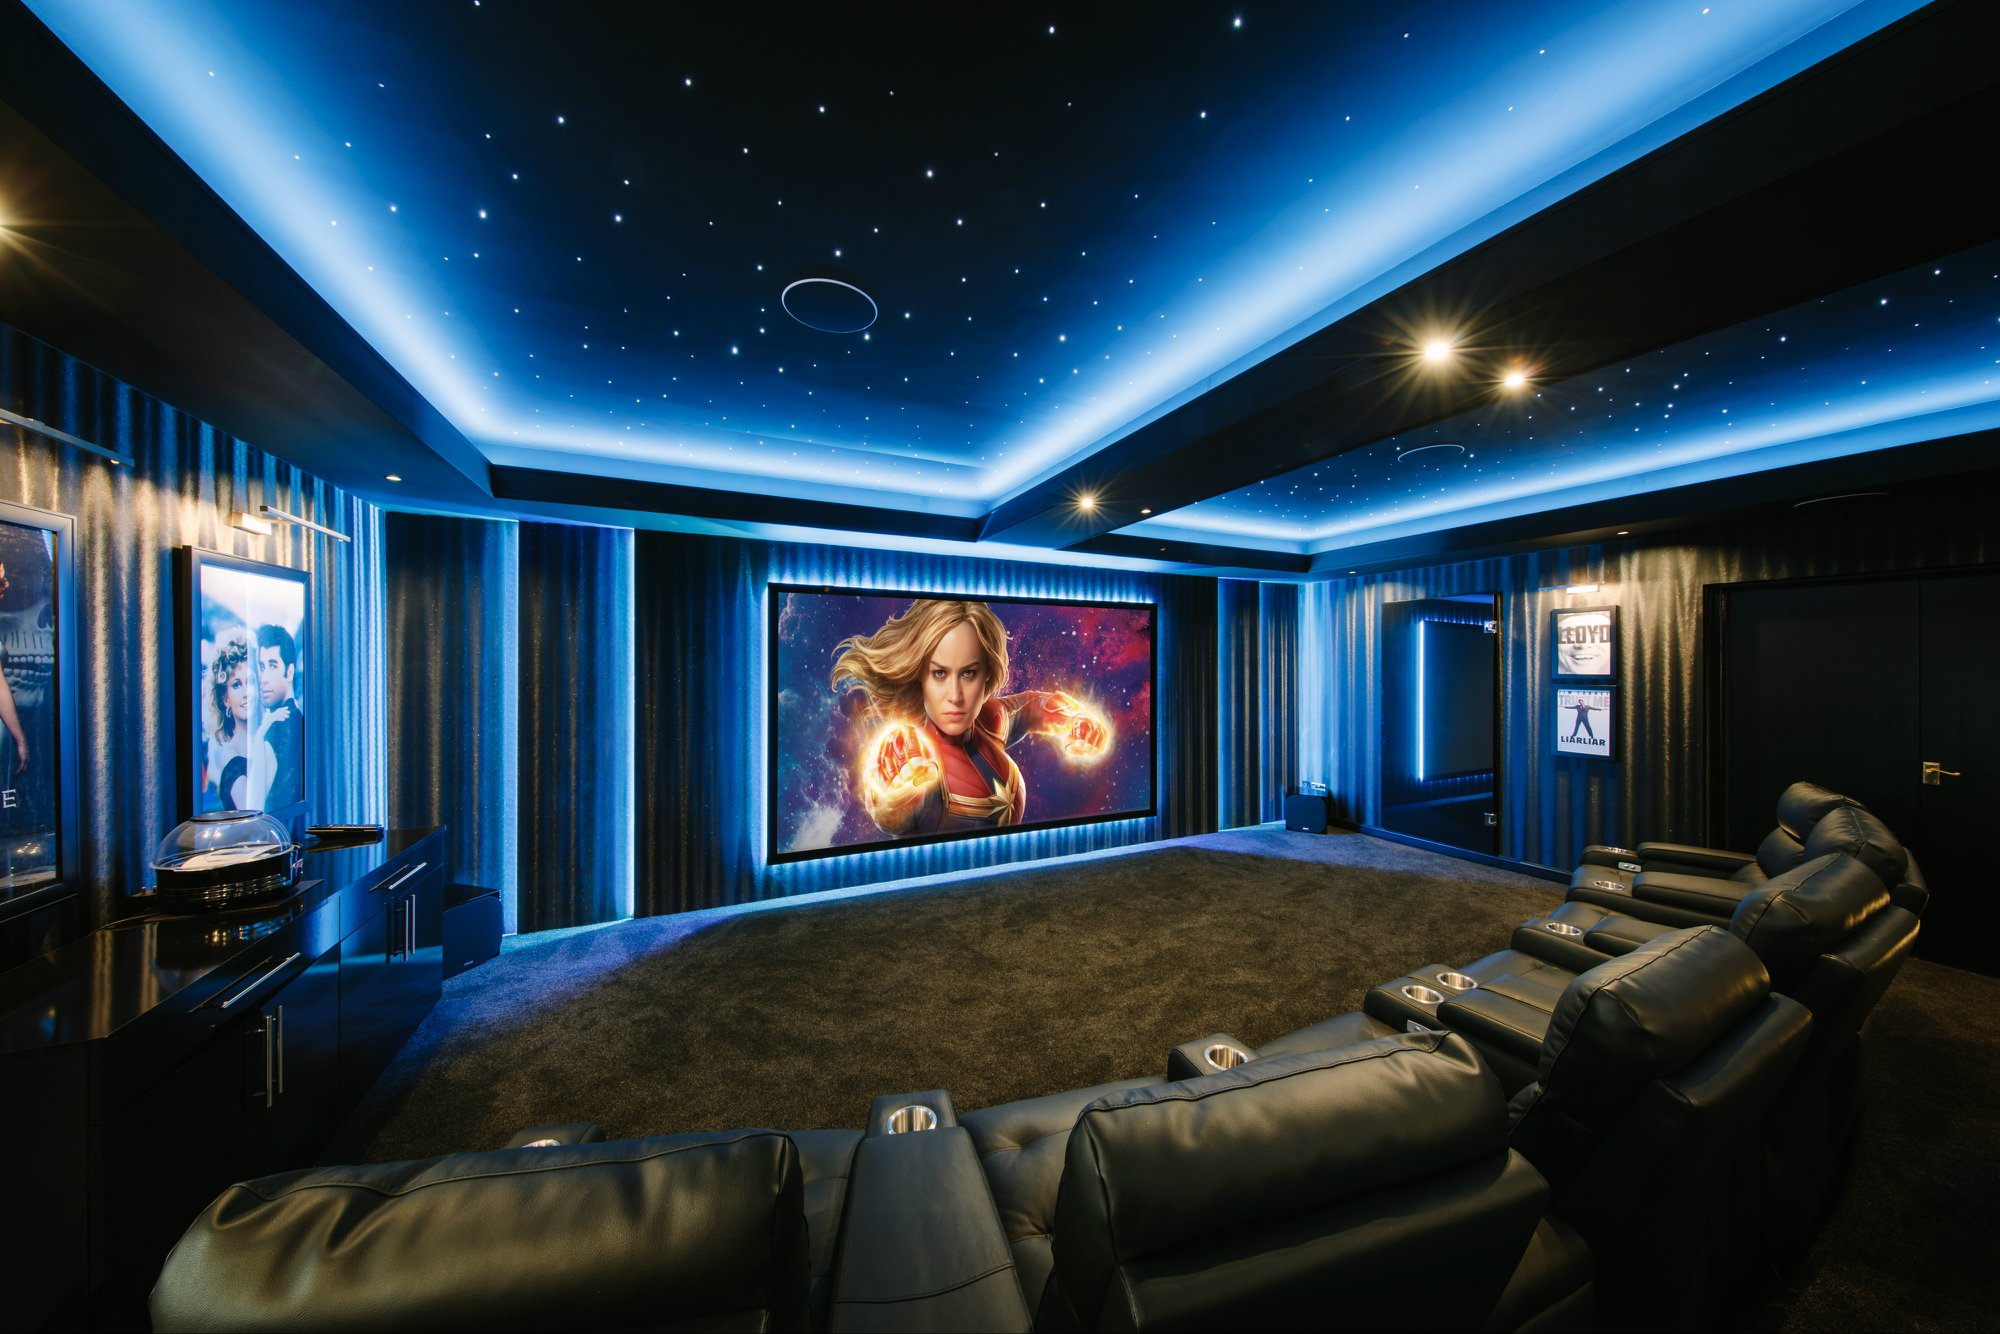 cutting-edge extravagant home cinema